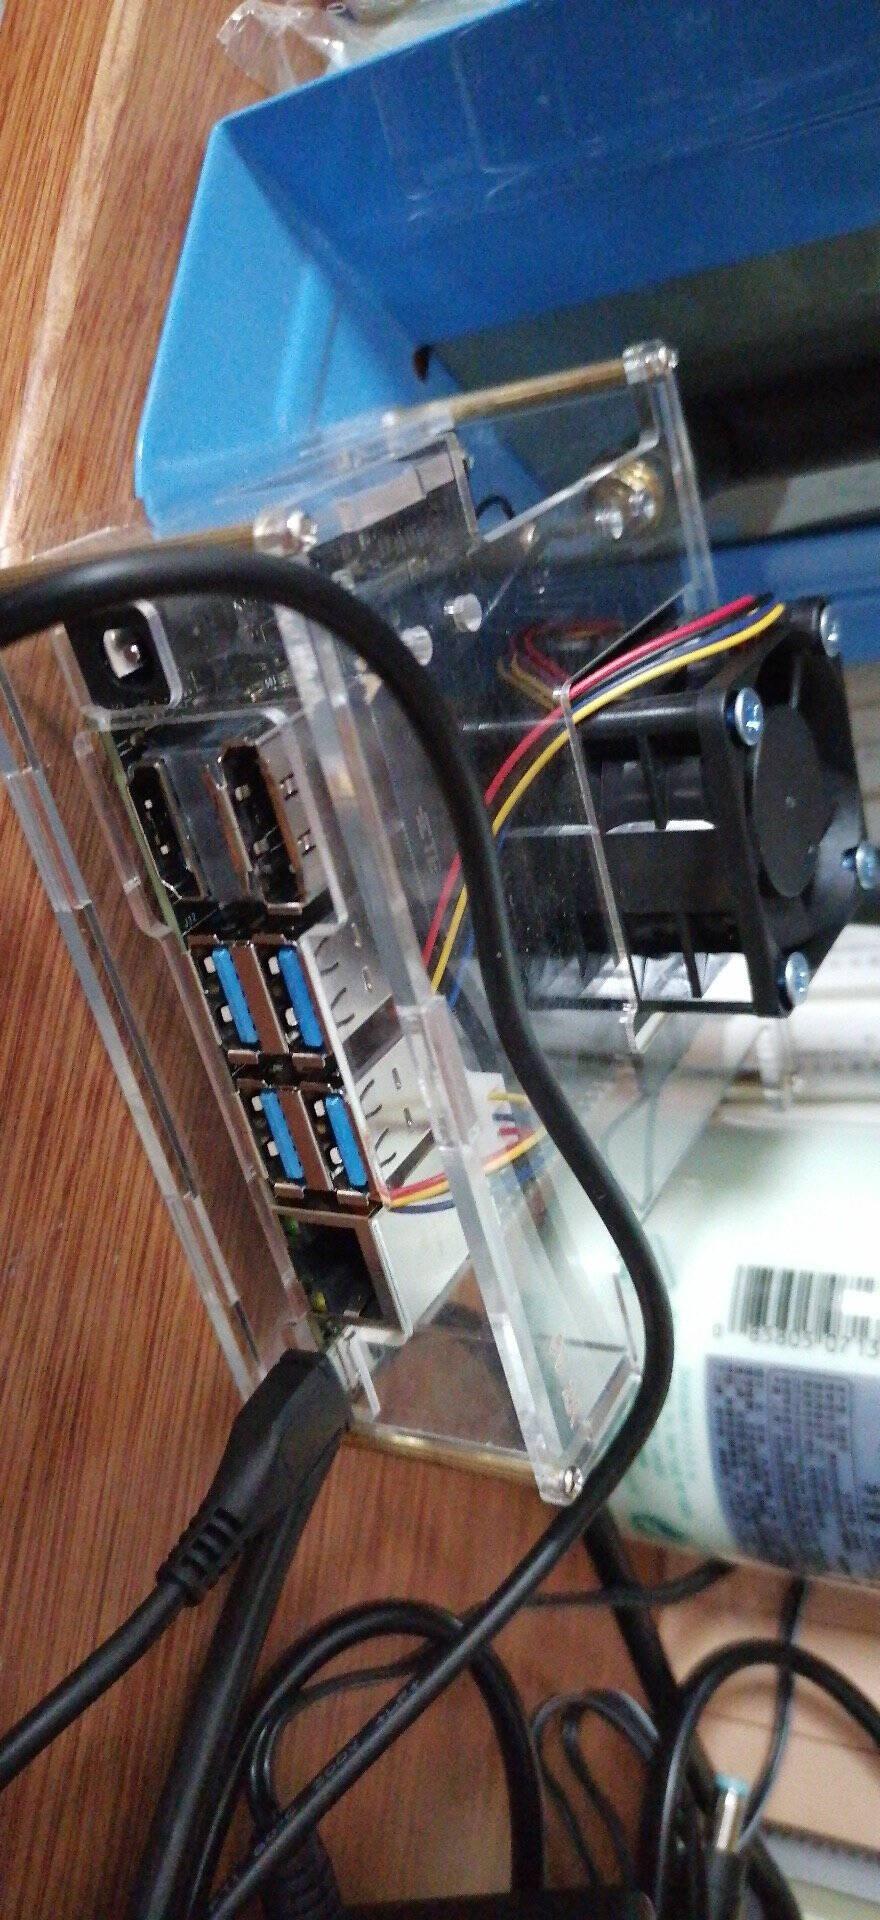 jetsonnanob01英伟达NVIDIA开发板TX2人工智能xaviernx视觉AGX英伟达2GB主板